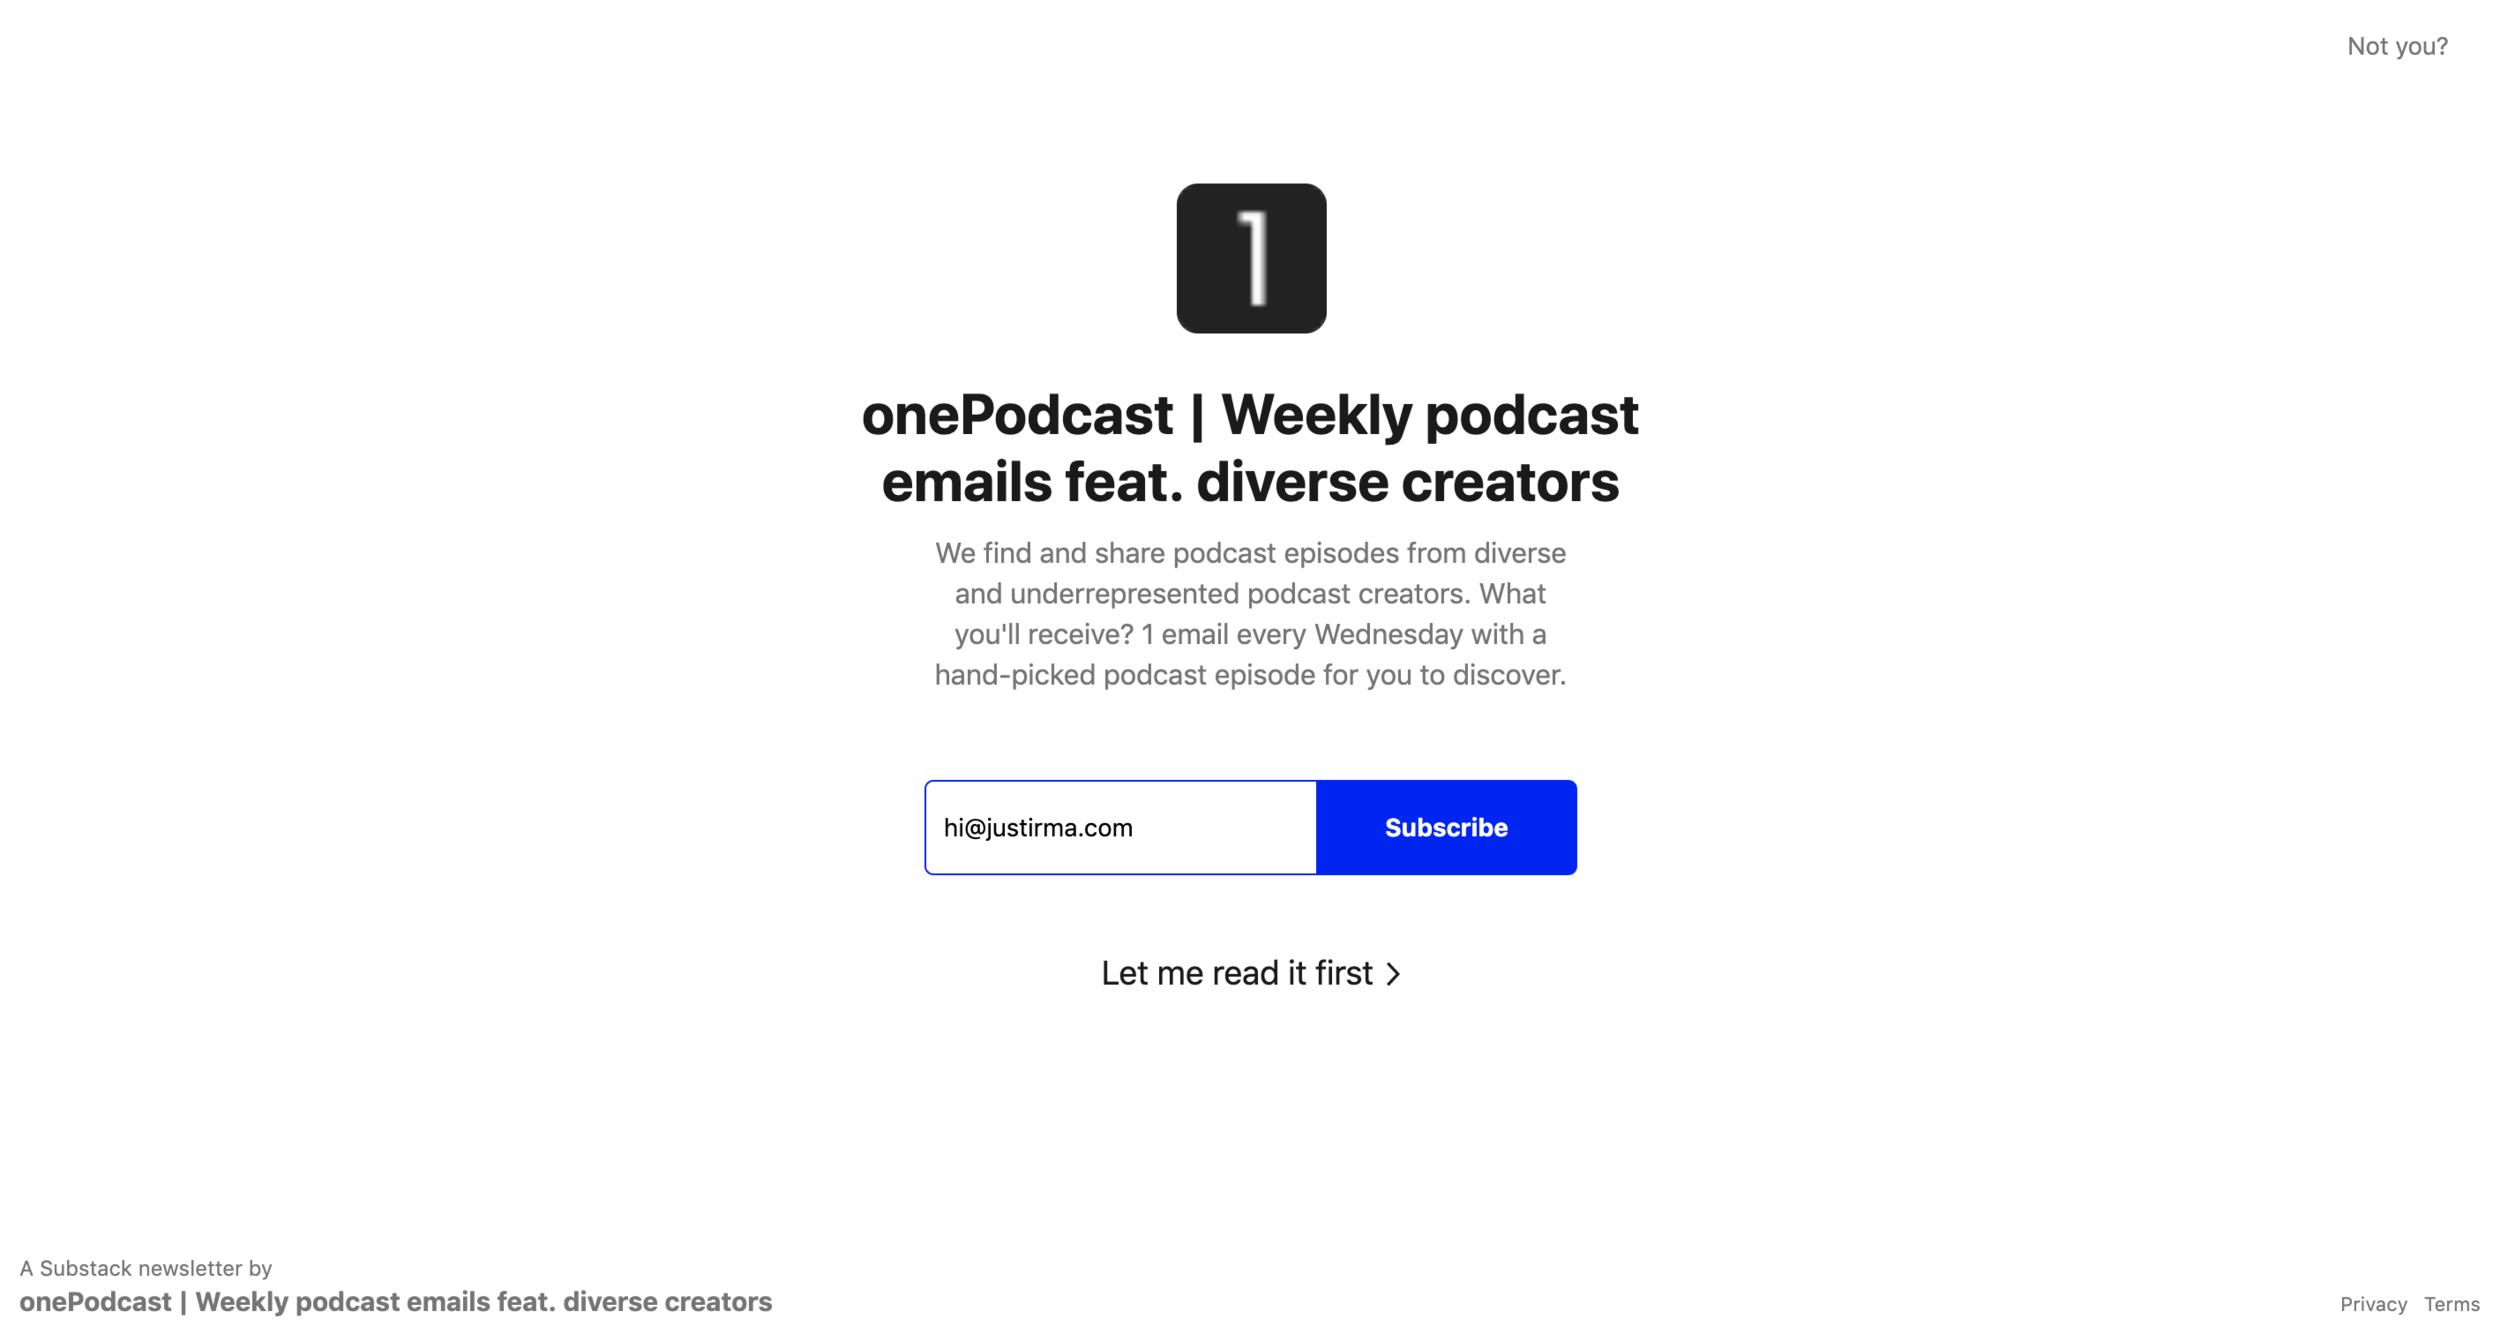 OnePodcast Newsletter for Underrepresented Creators - No Code Build